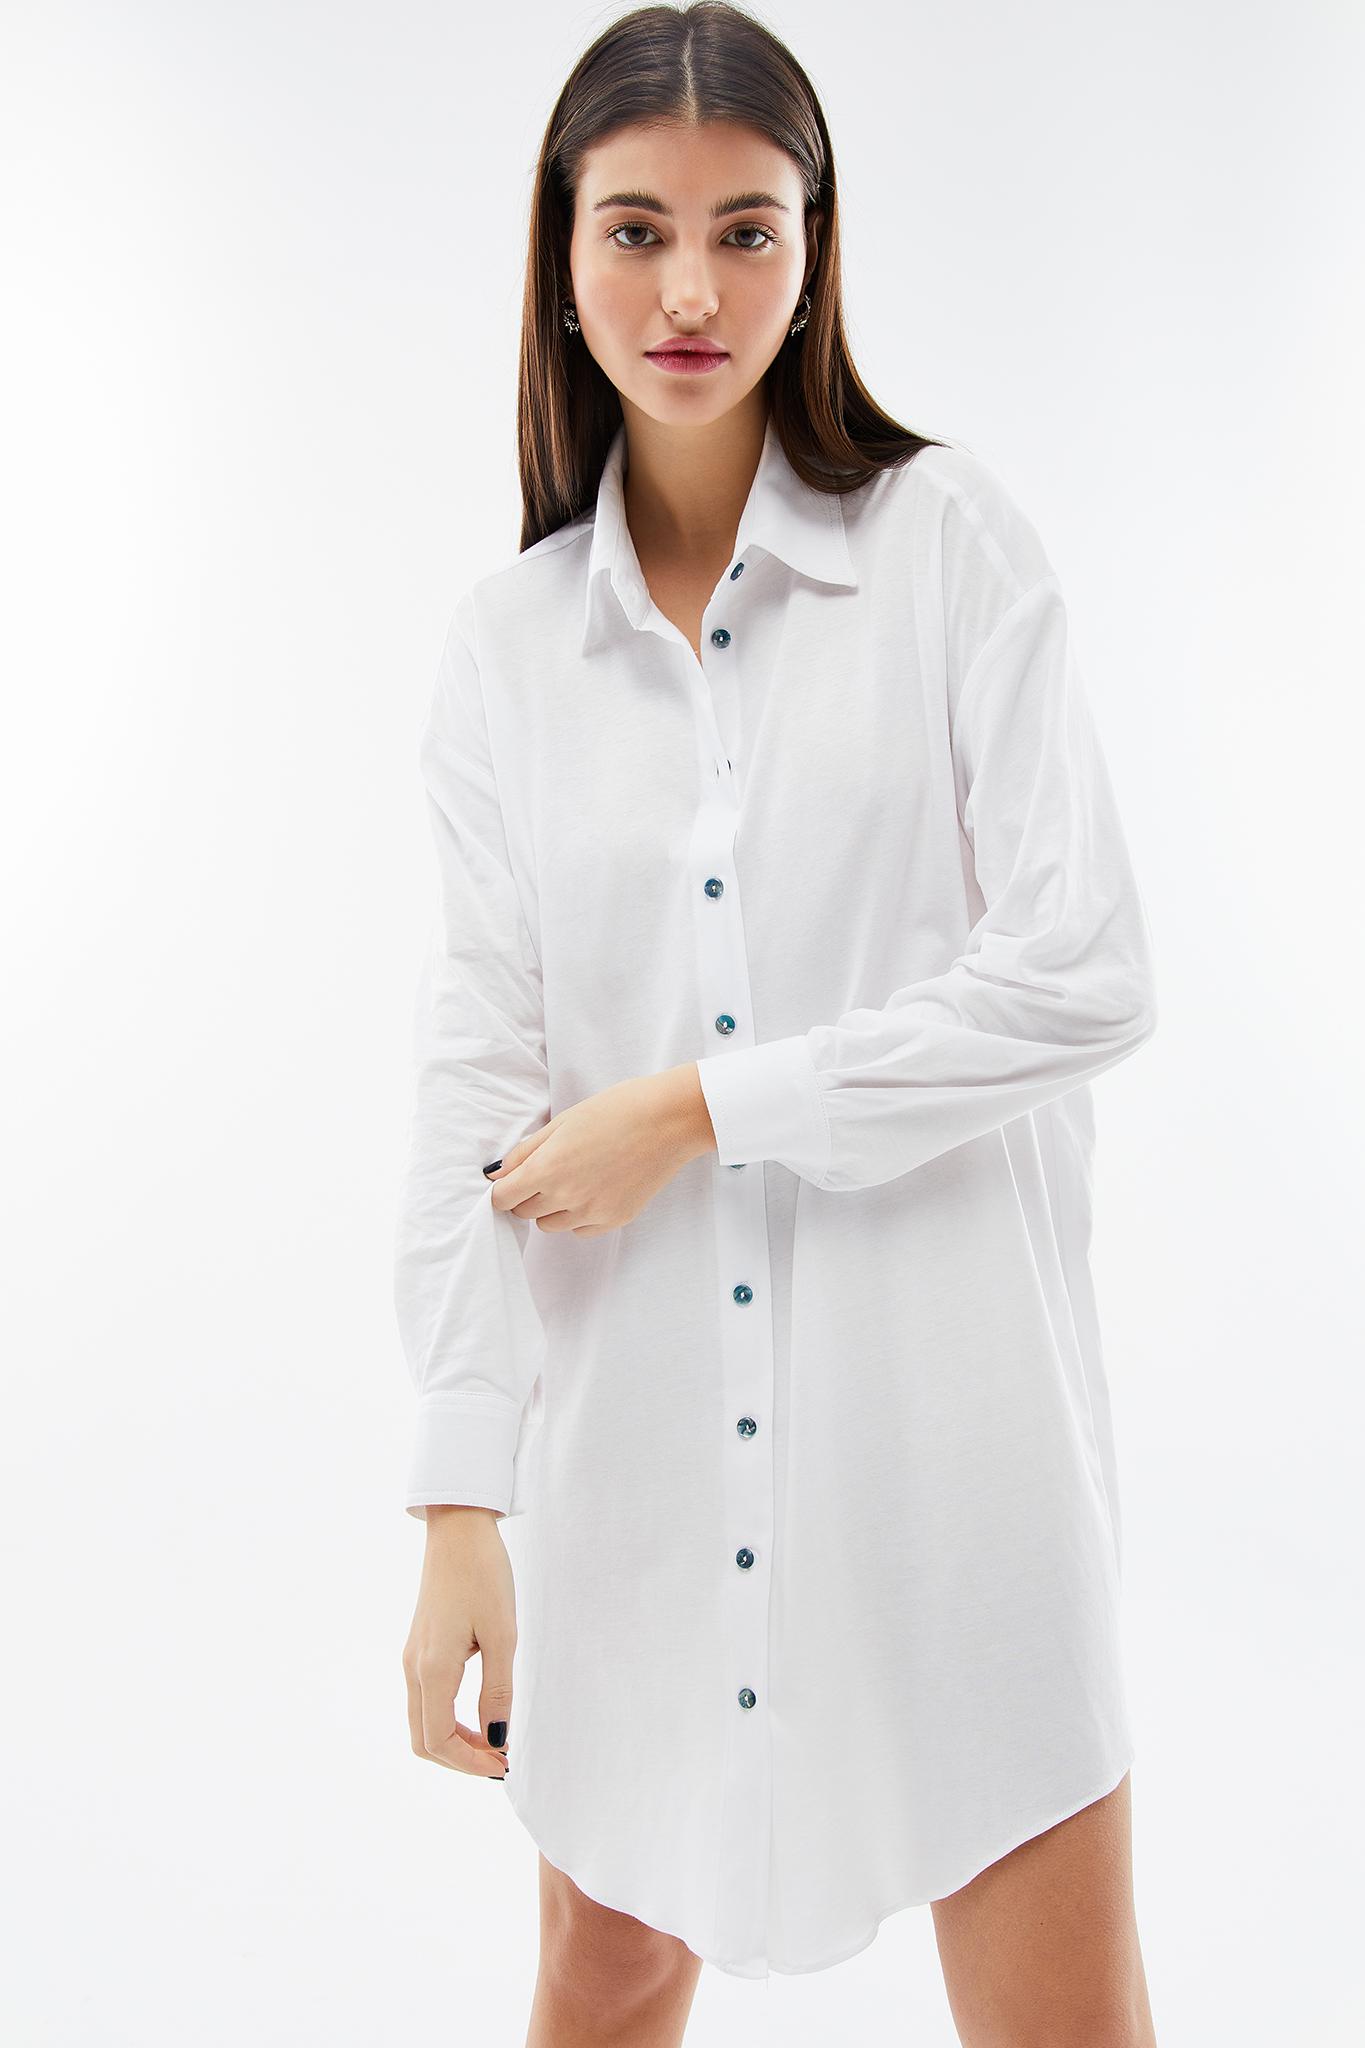 BLAMEYOURDAZE white oversized dress